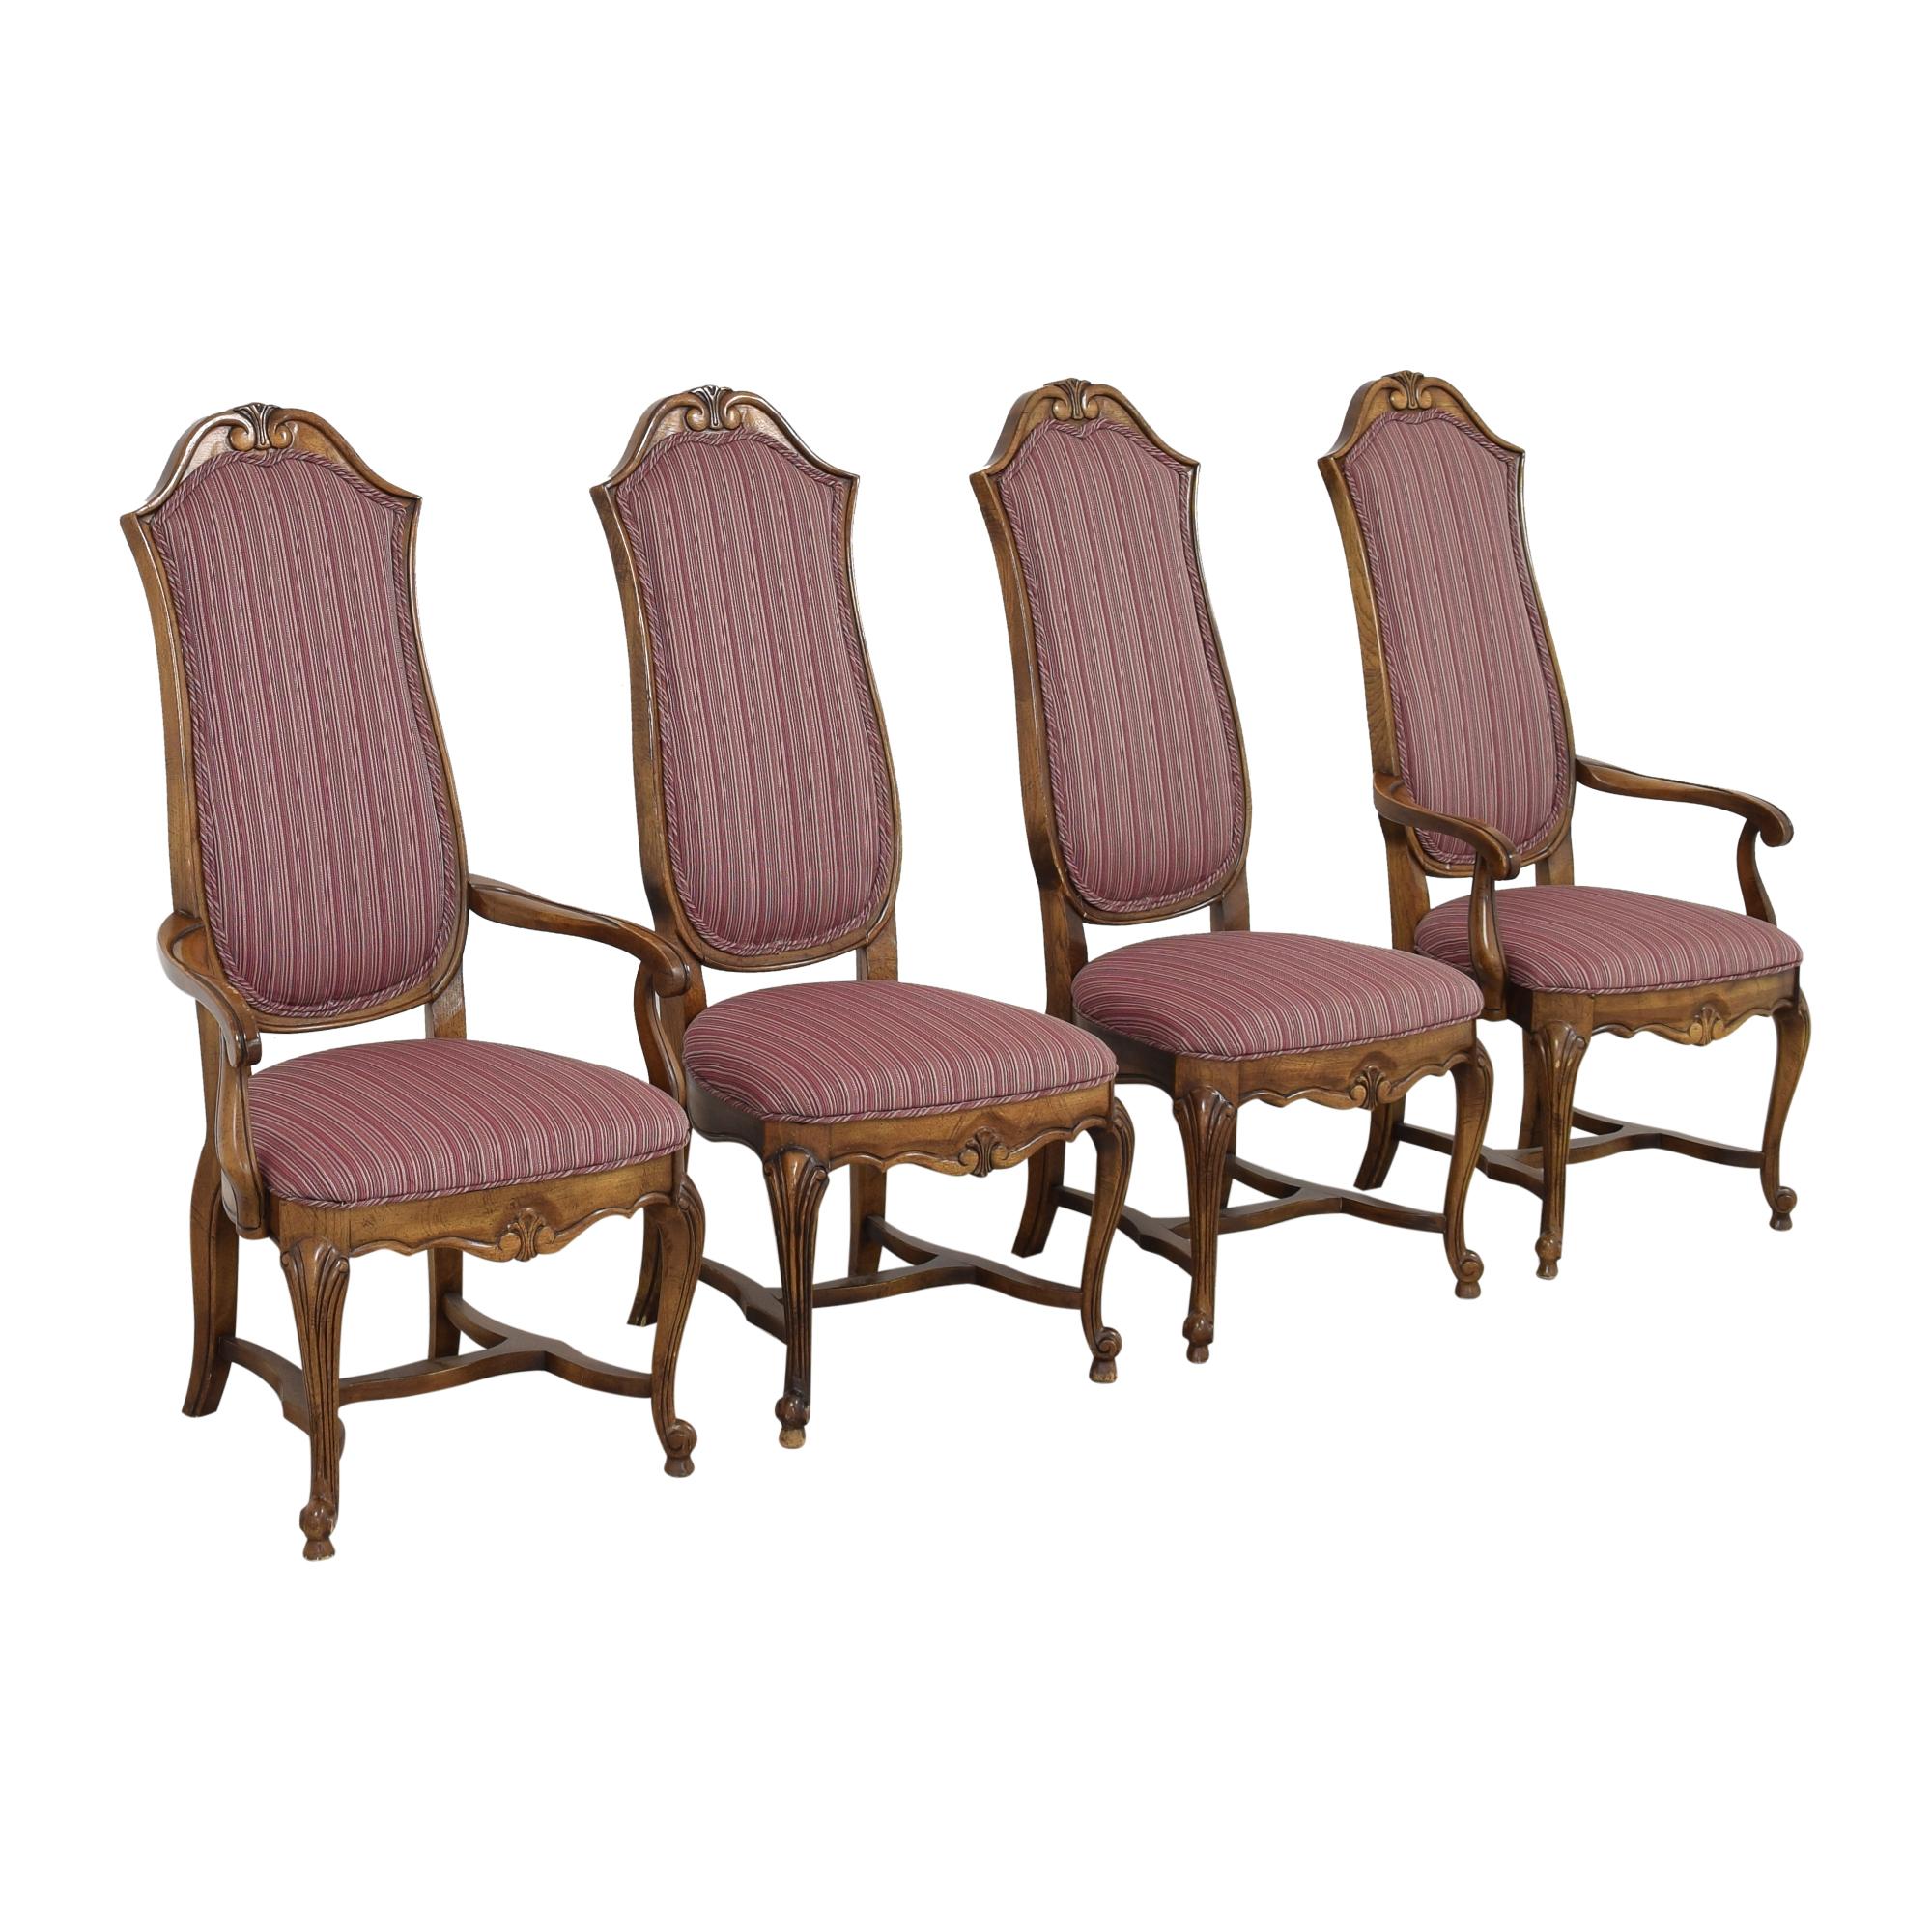 Ethan Allen Ethan Allen High Back Dining Chairs nj